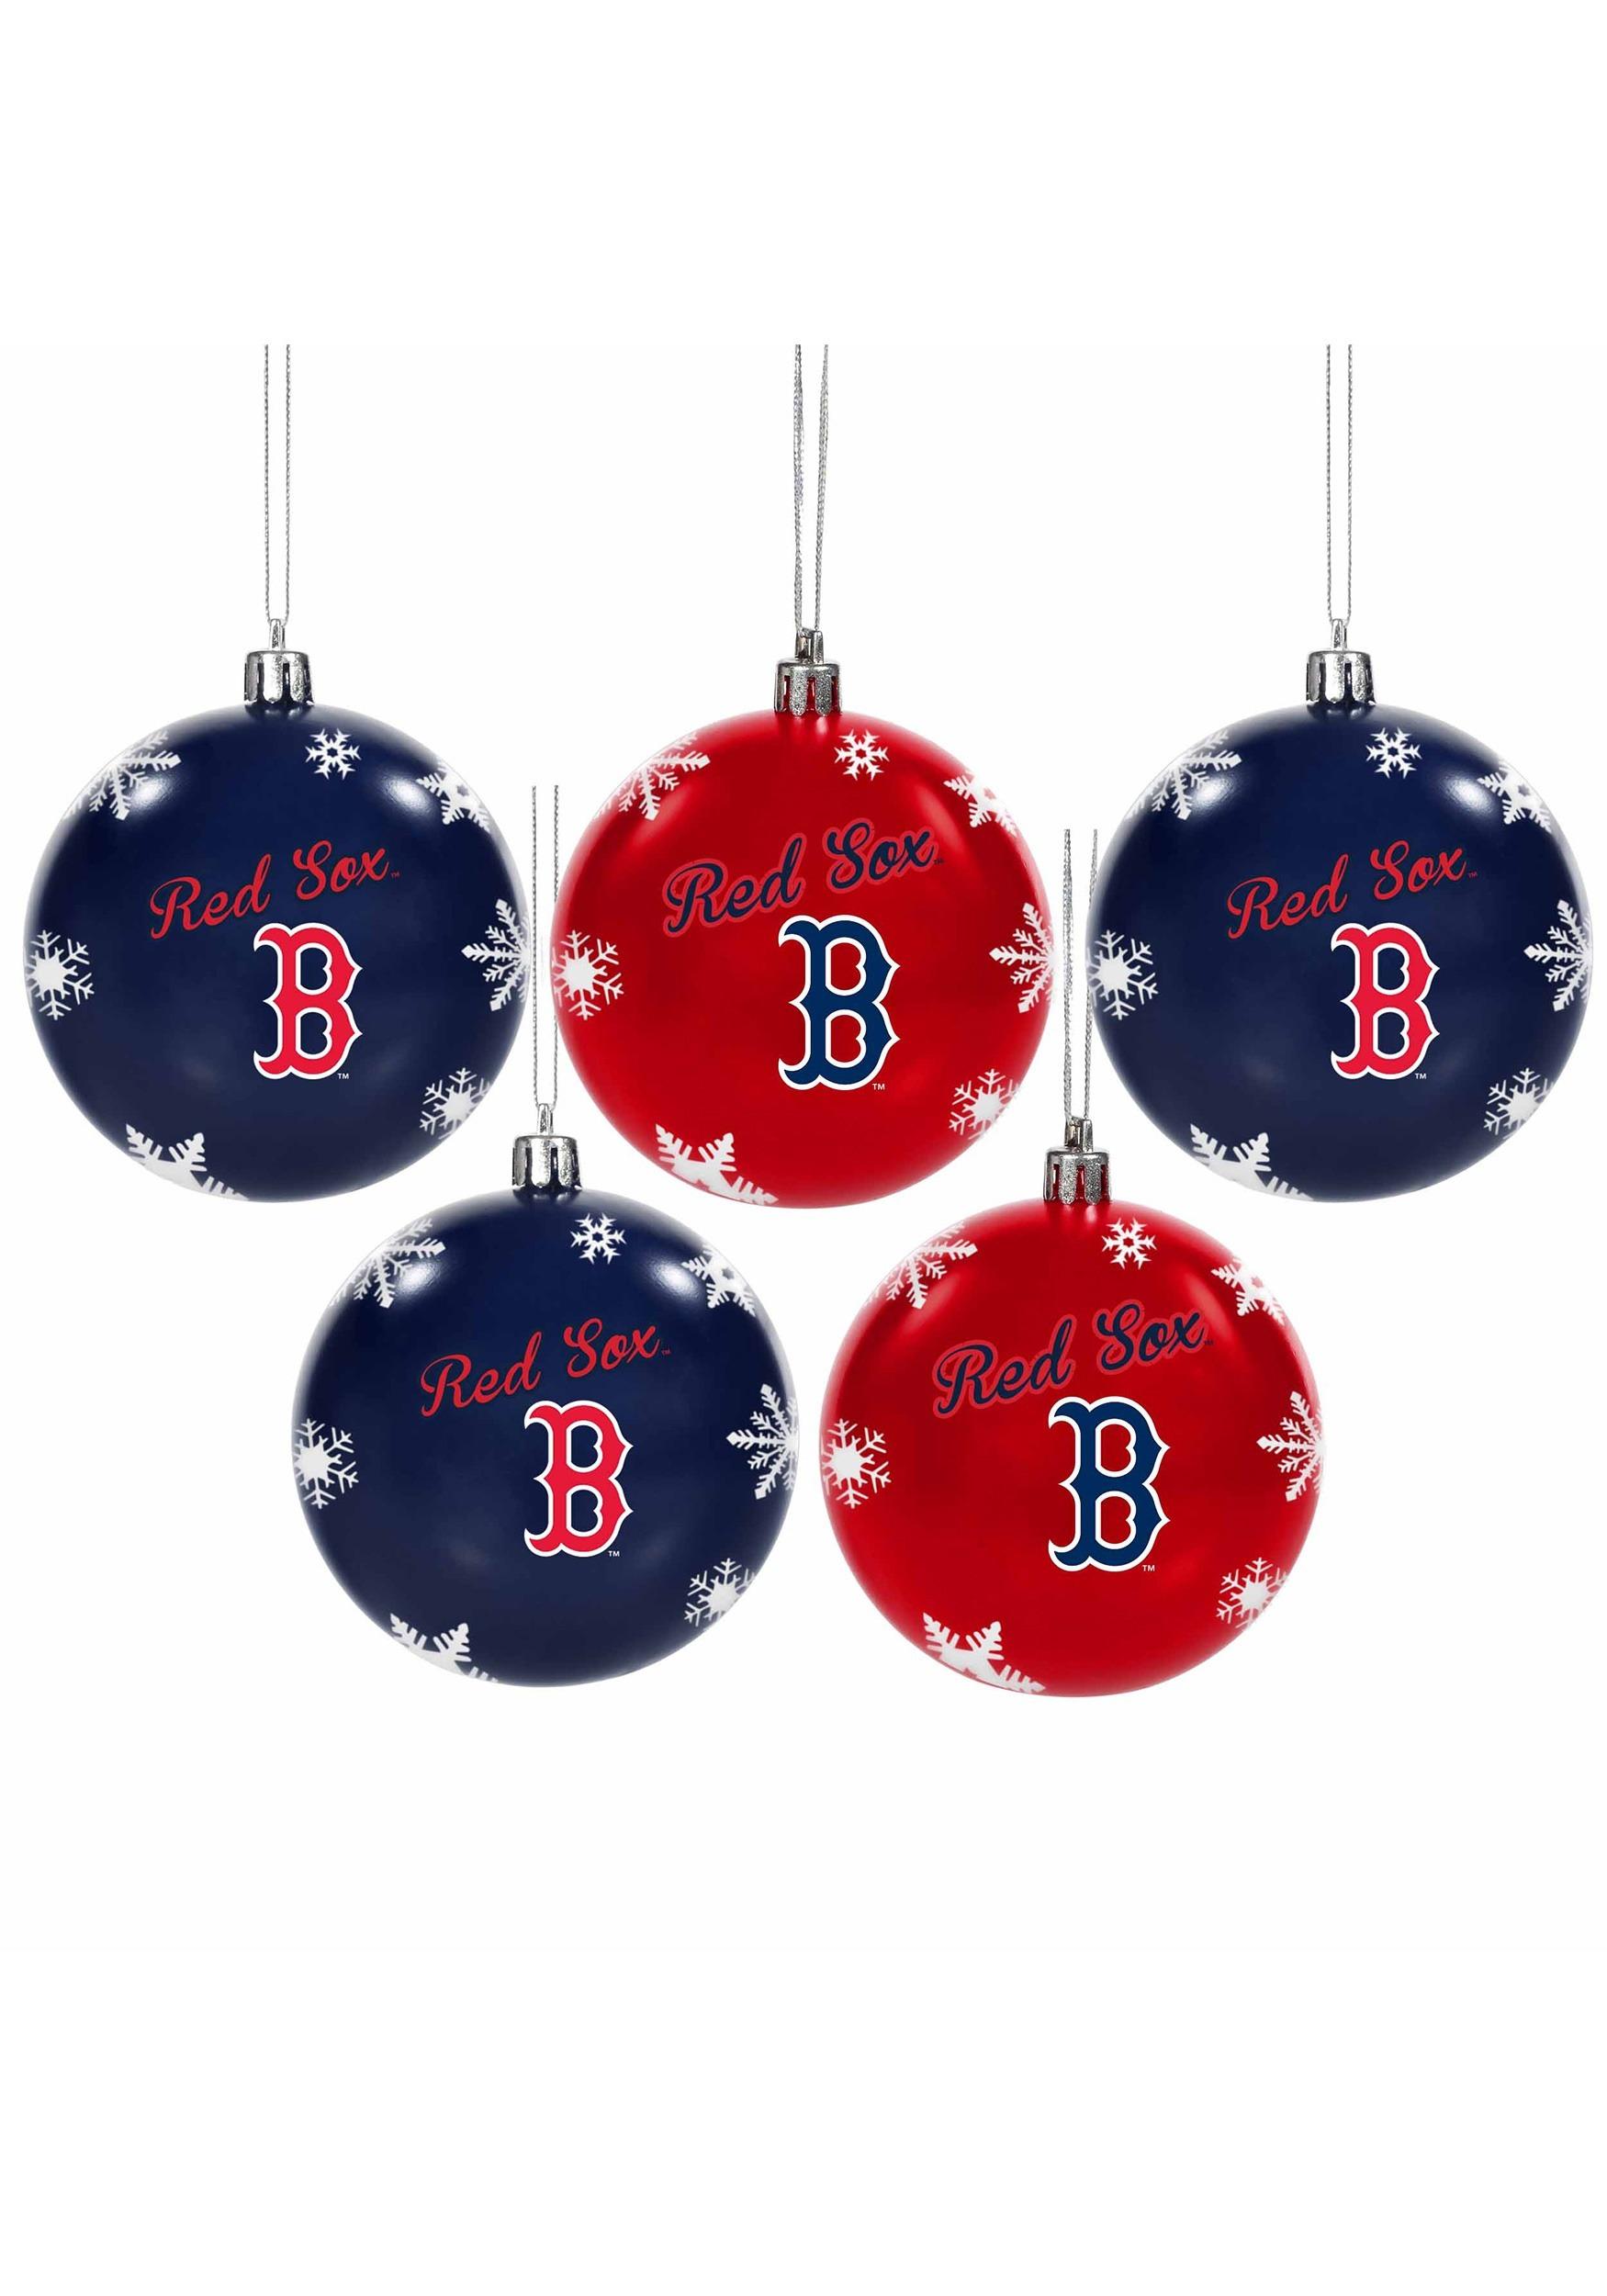 Boston red sox 5 pack shatterproof ball ornament set